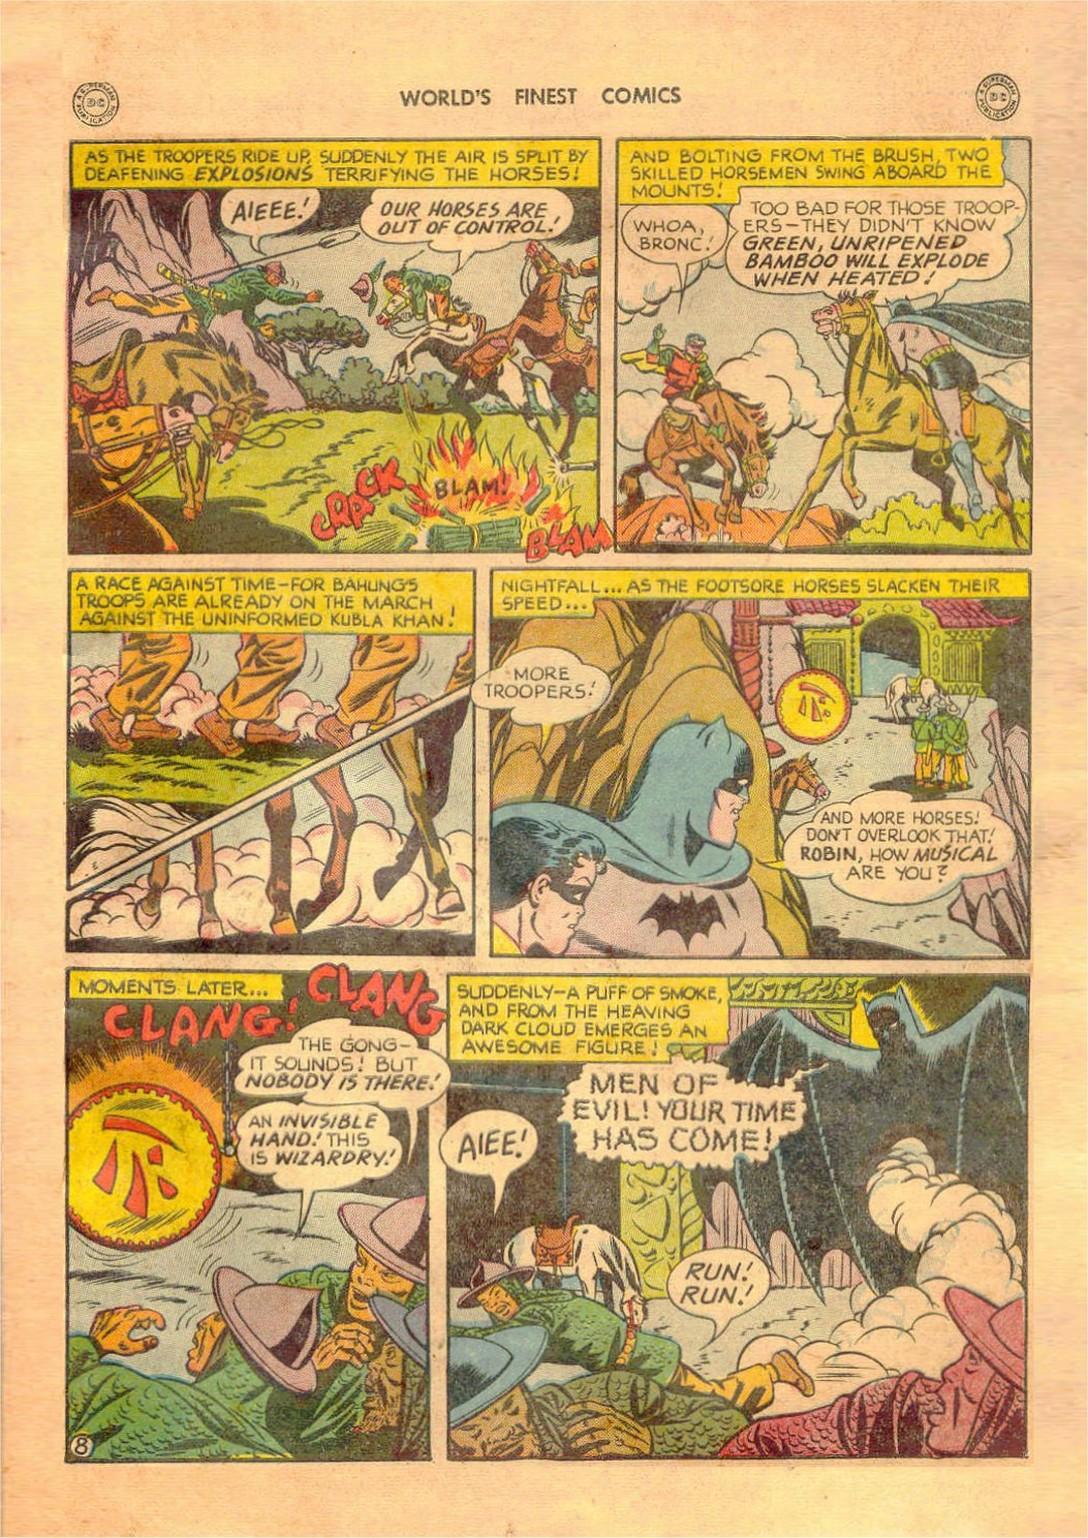 Read online World's Finest Comics comic -  Issue #42 - 69